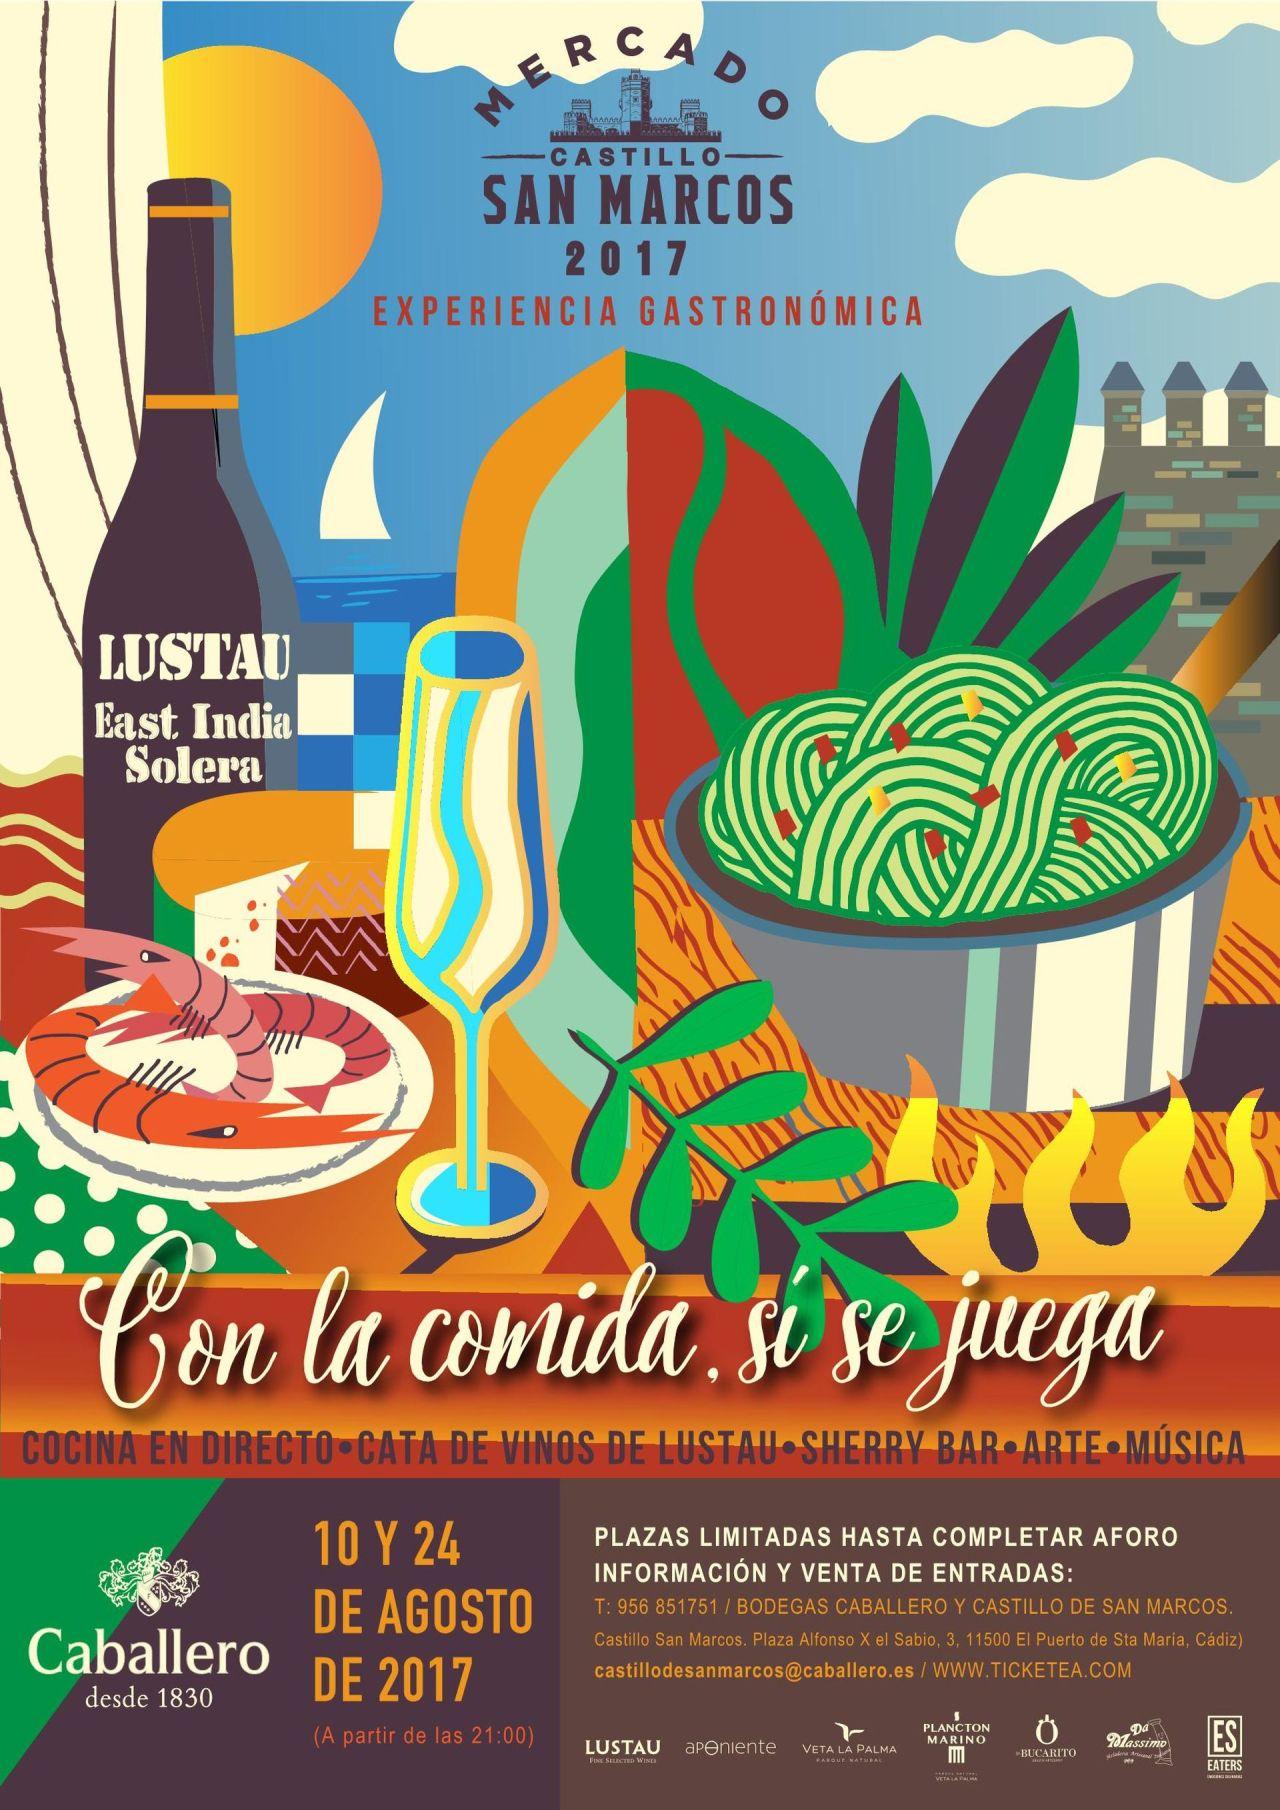 Discover Sherry recommends: XXVII Ciclo Cultural Caballero: Con la comida, sí se juega.(Spanish)